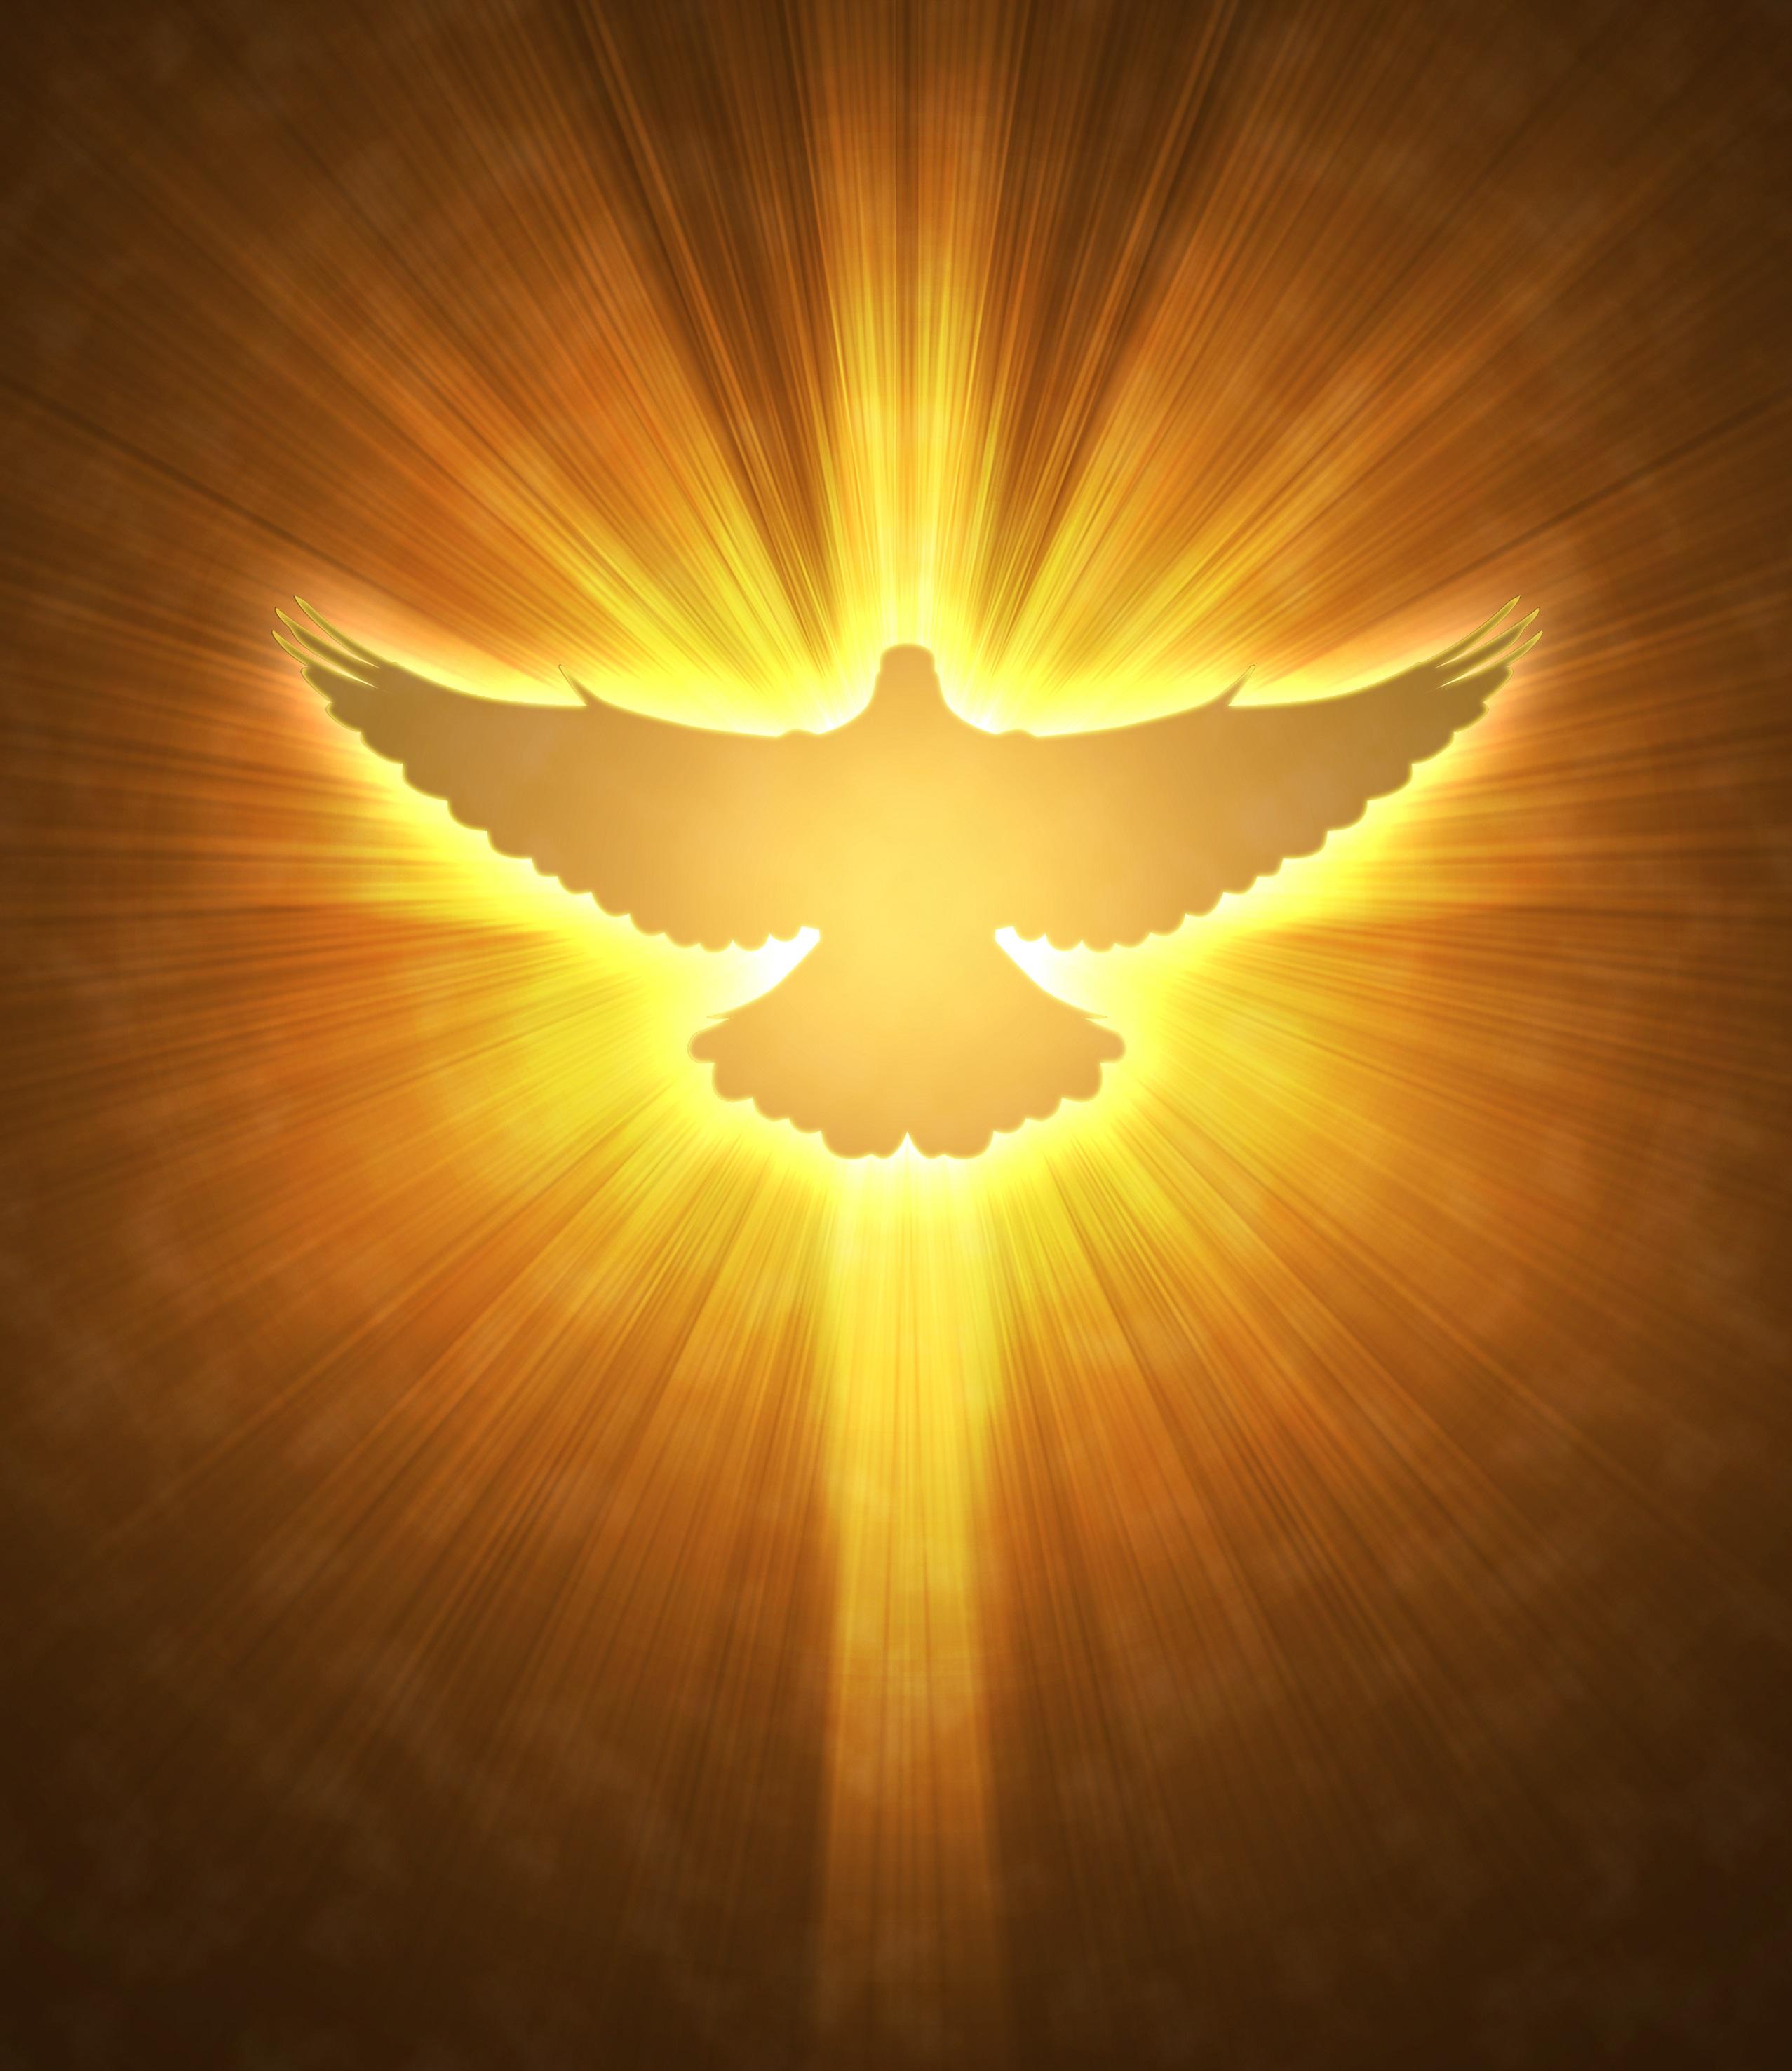 wings pinterest com 2